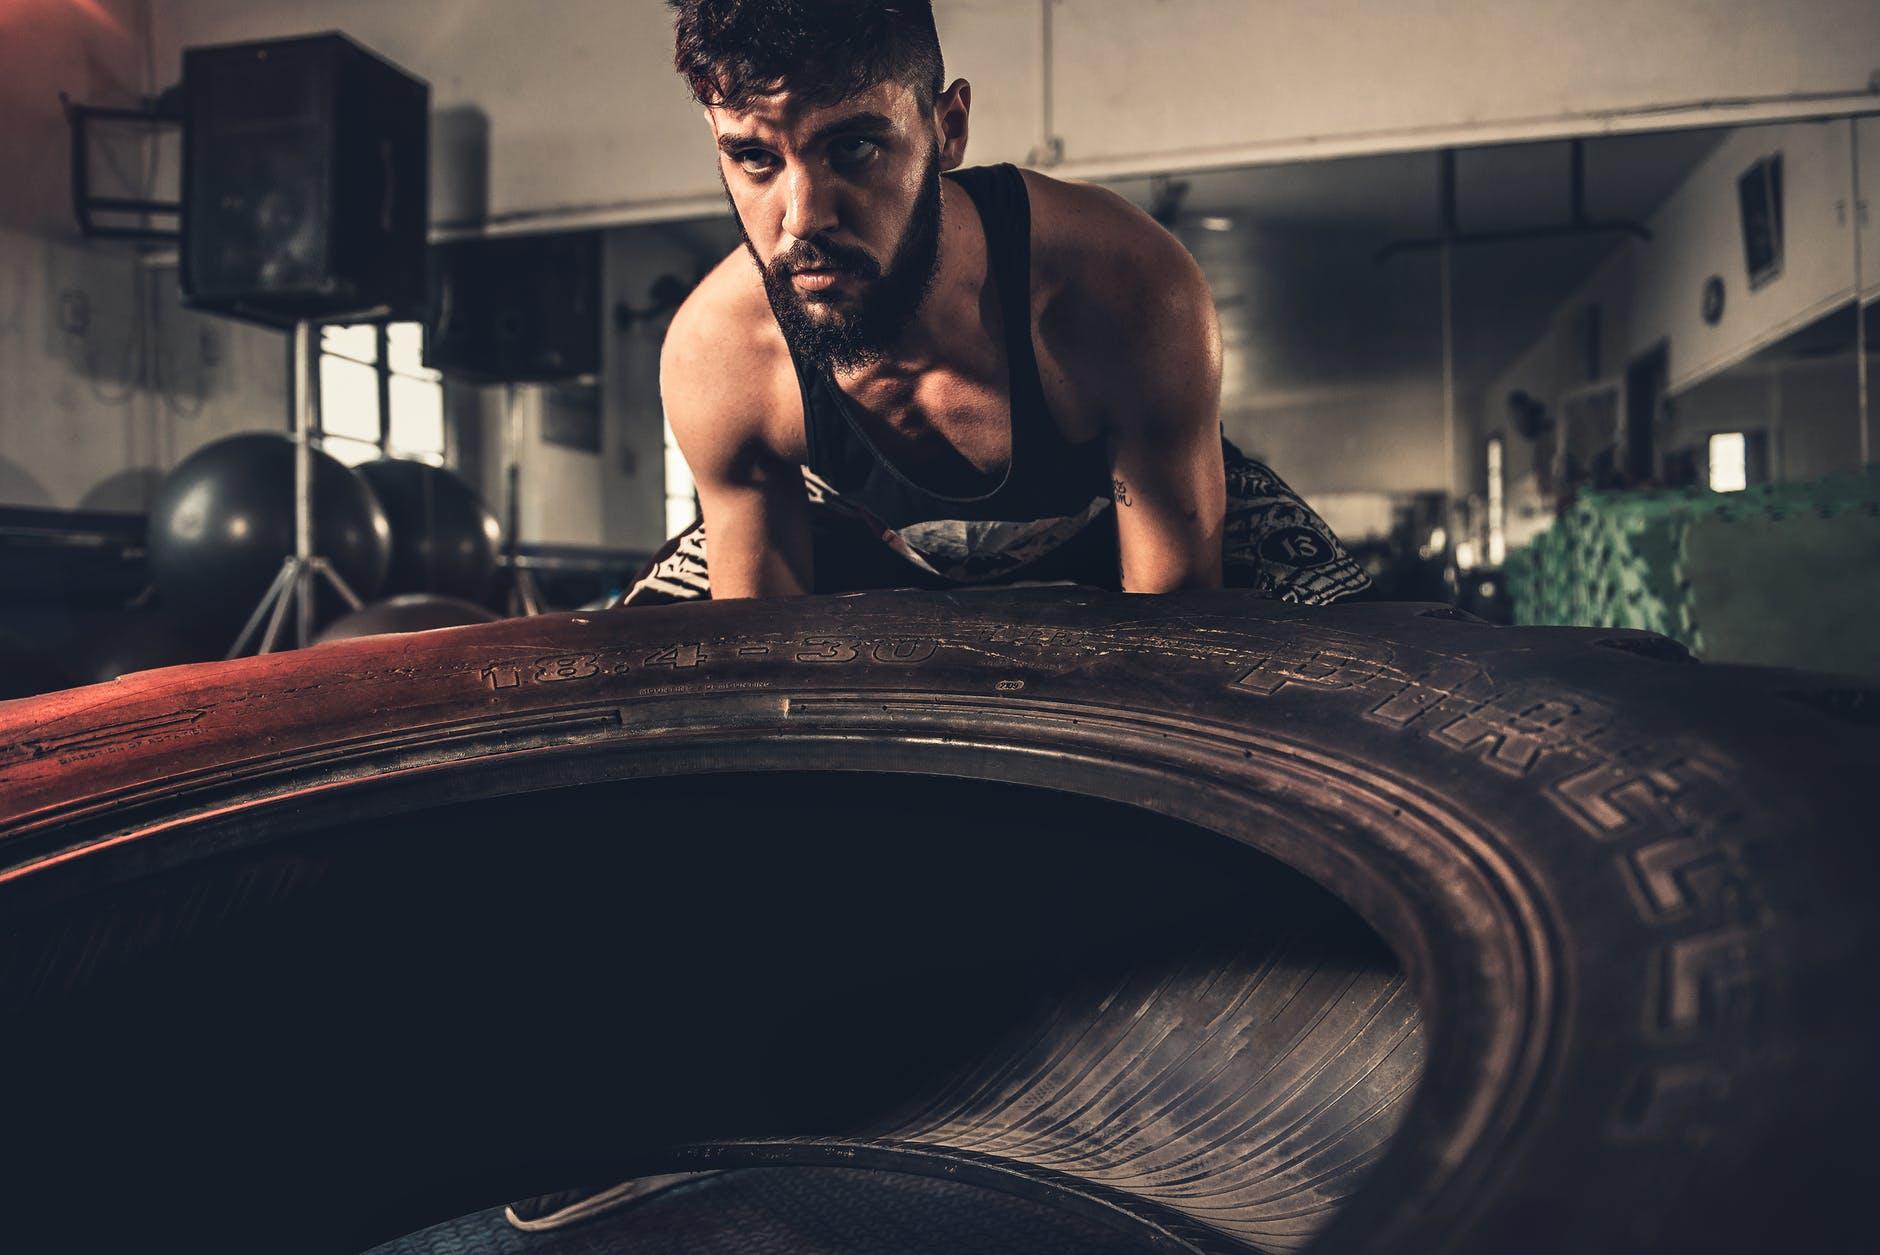 tire lifting creatine.jpeg